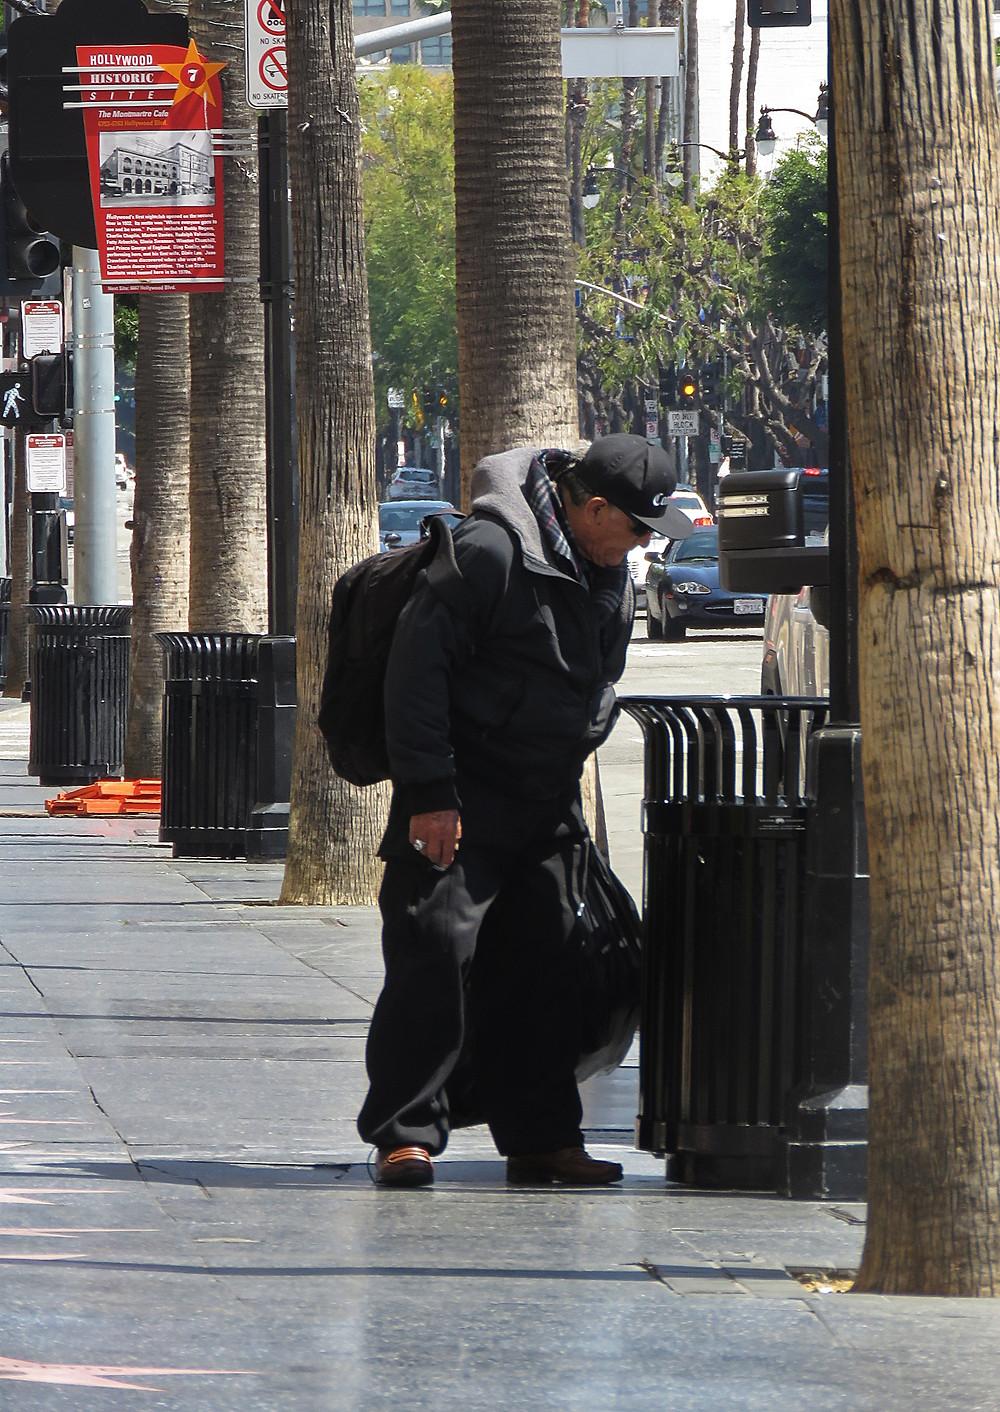 hollywood blvd homeless covid-19